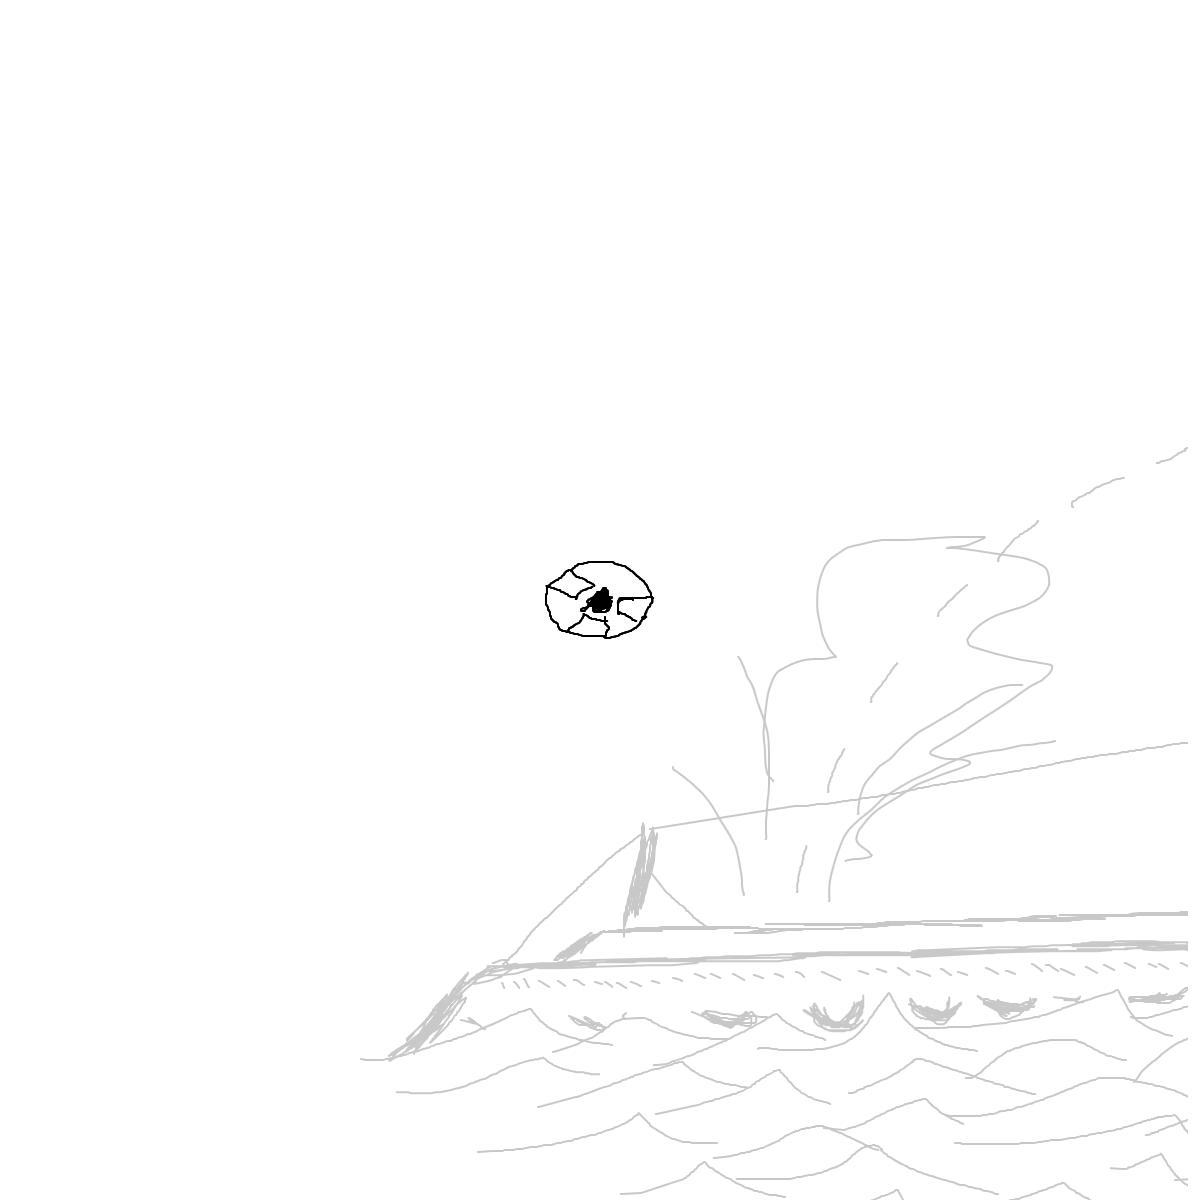 BAAAM drawing#4021 lat:21.7799797058105470lng: -160.2042236328125000